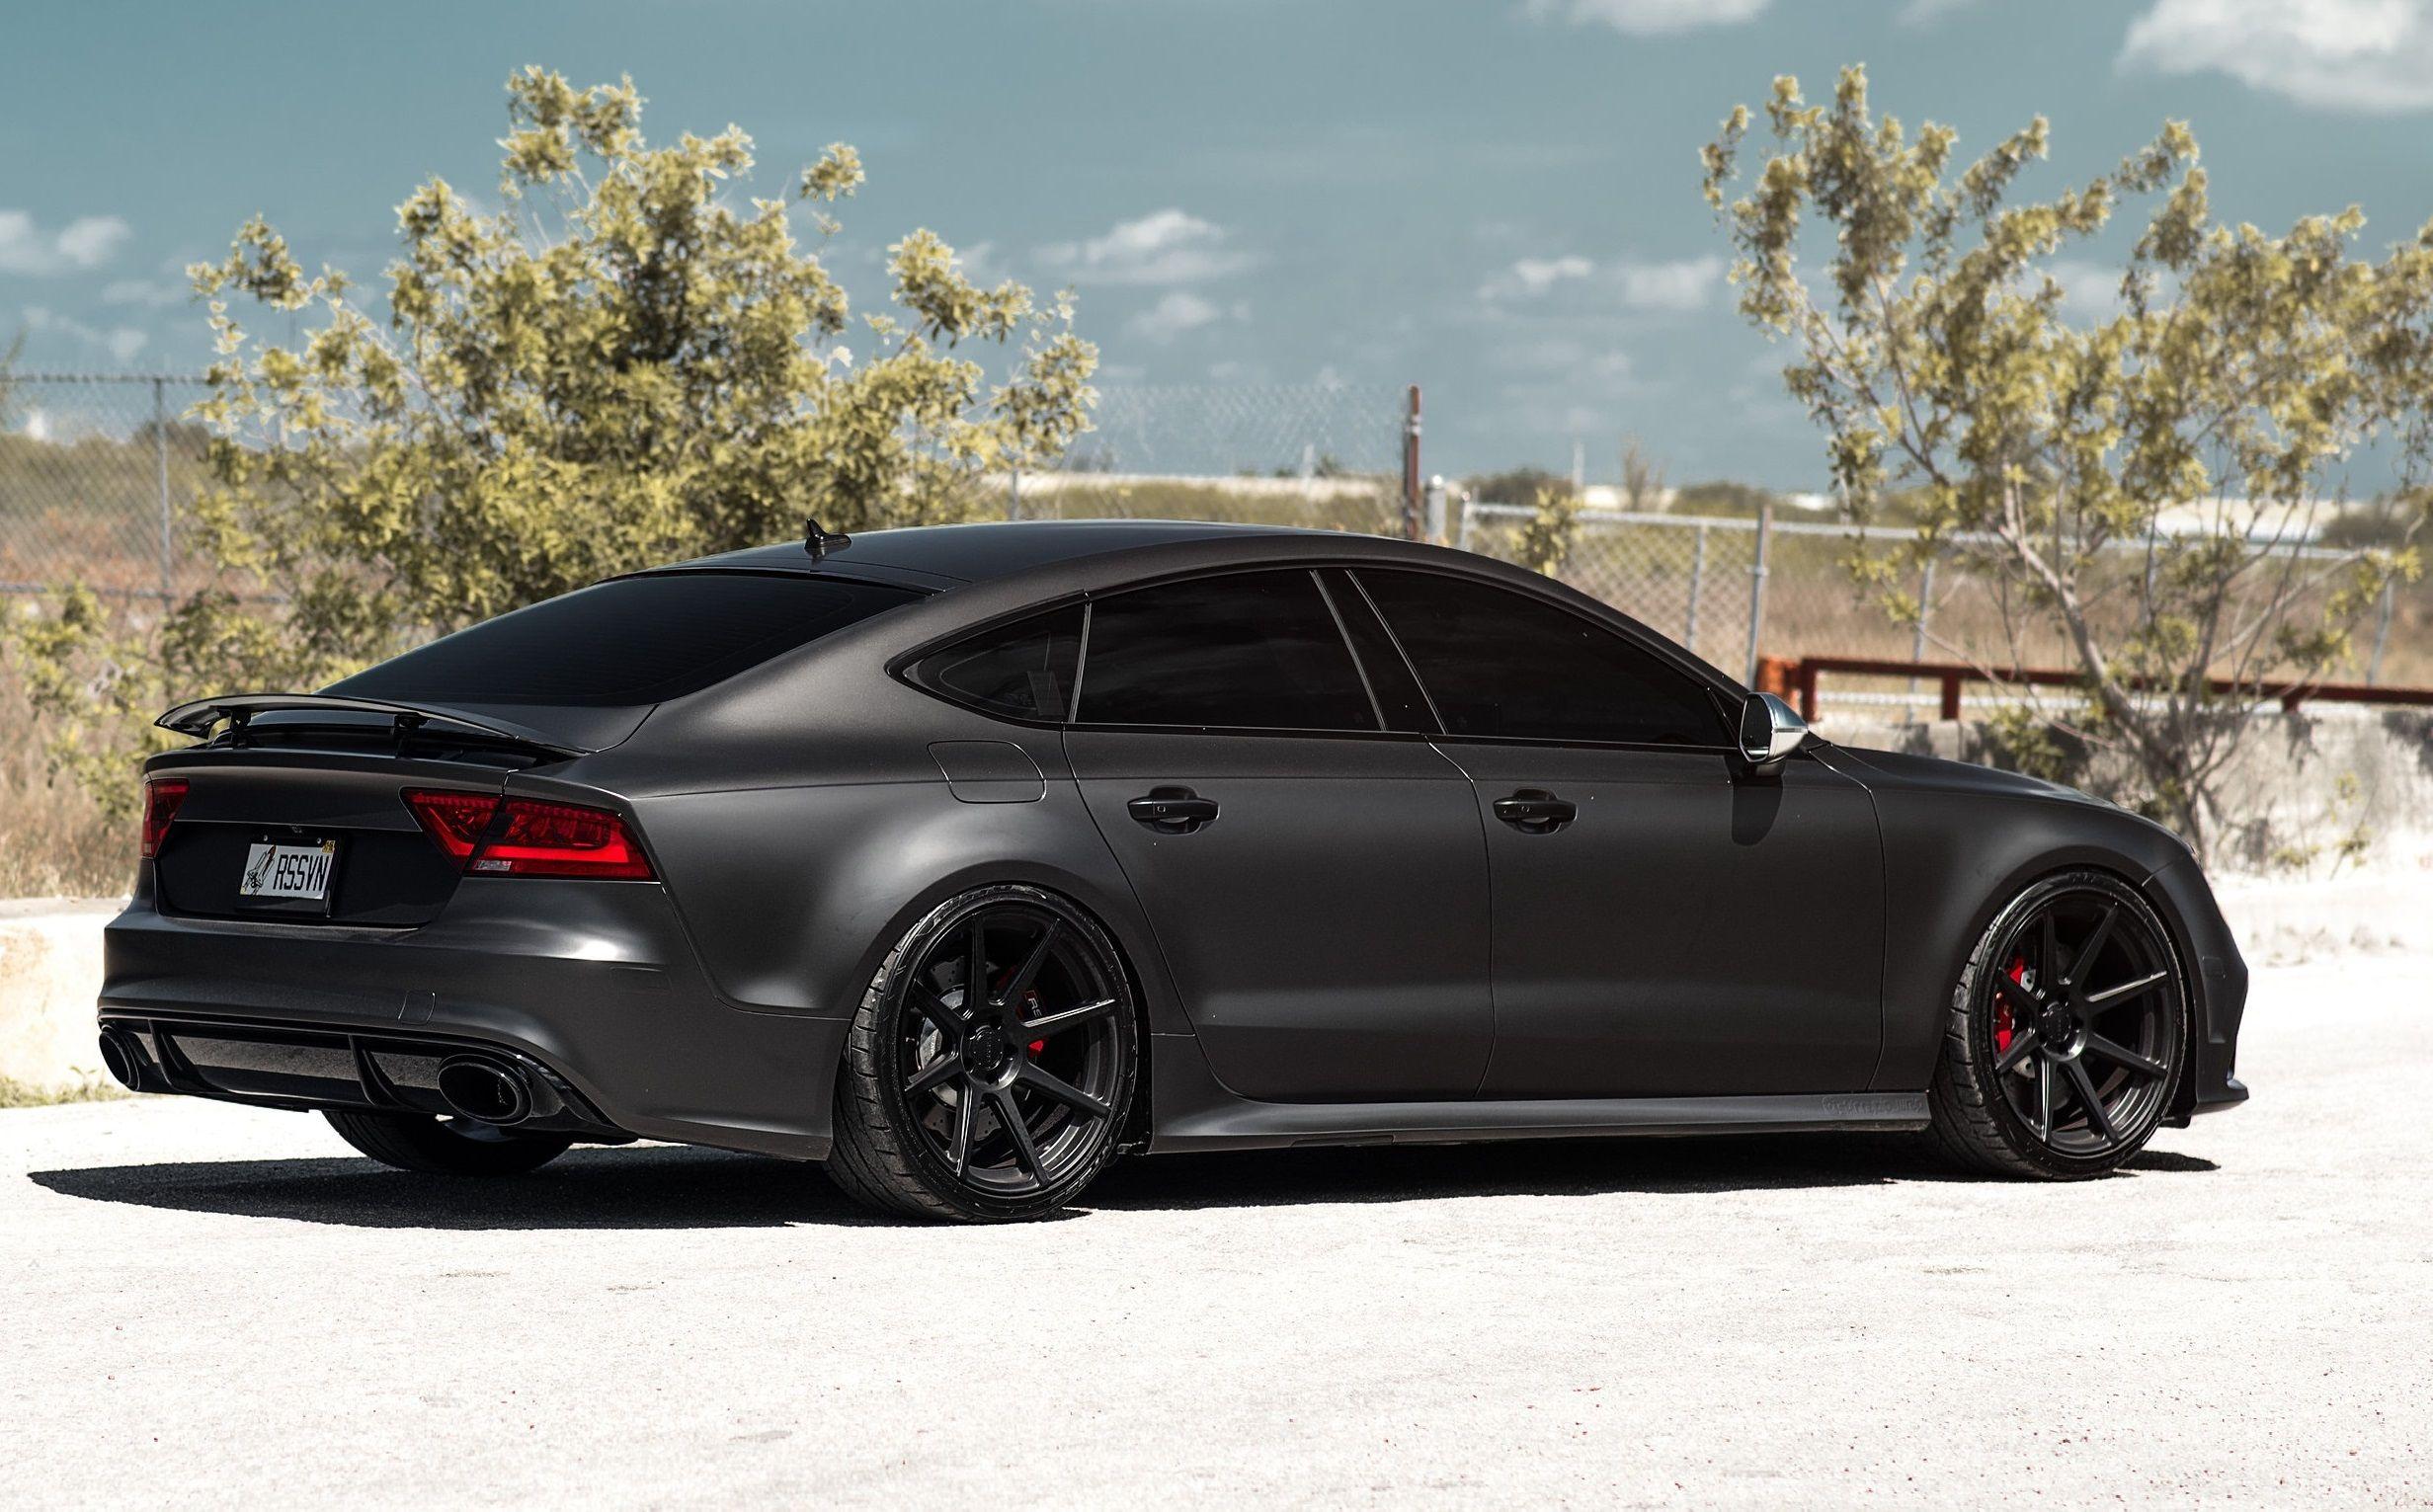 Matt Black Audi Rs7 On Velgen Wheels Black Audi Audi Cars Audi Rs7